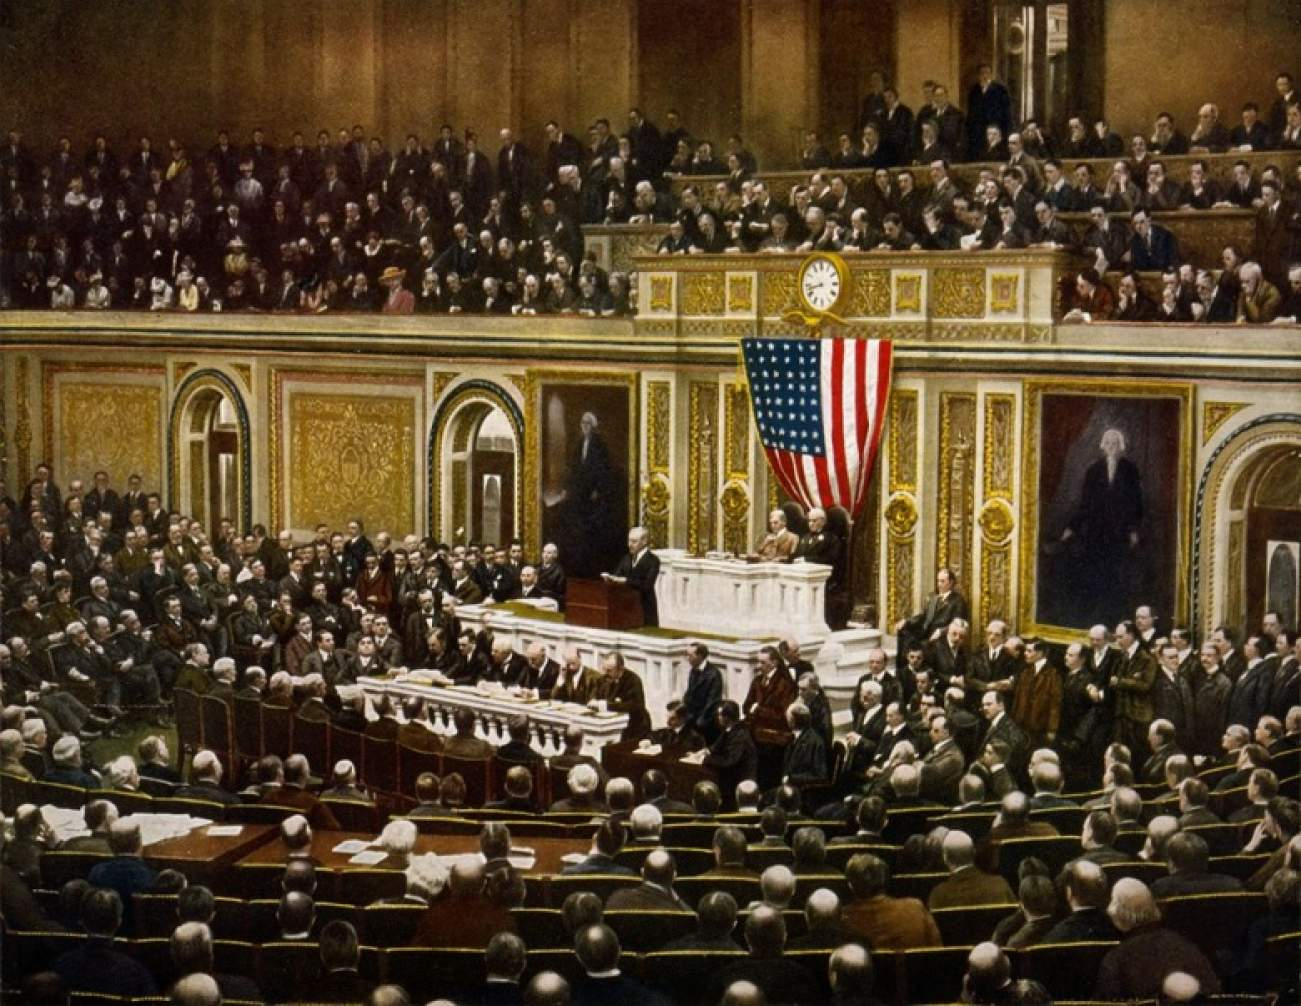 woodrow wilson inaugural address